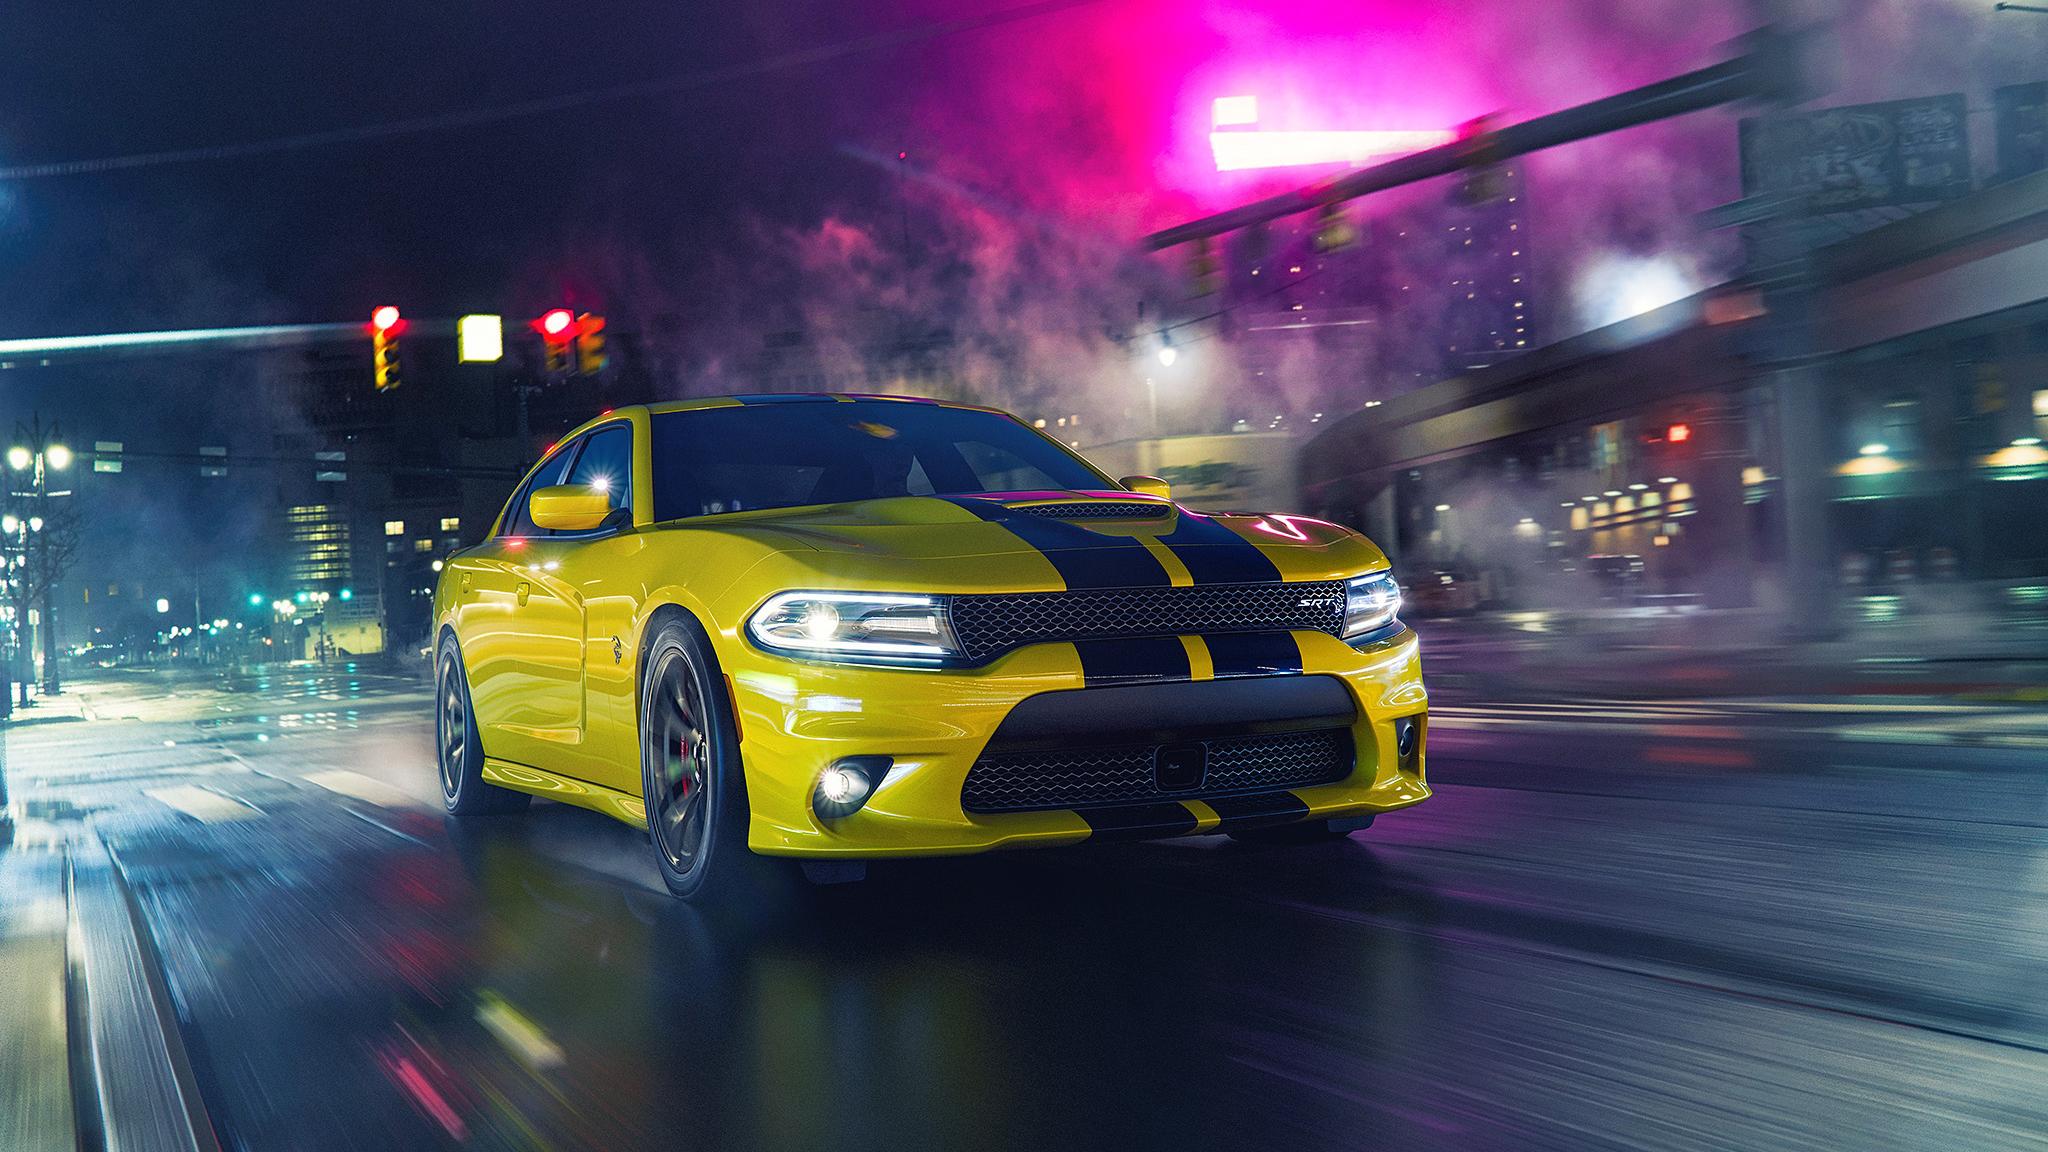 Dodge Charger Hellcat Wallpaper Hd Car Wallpapers Id 10789